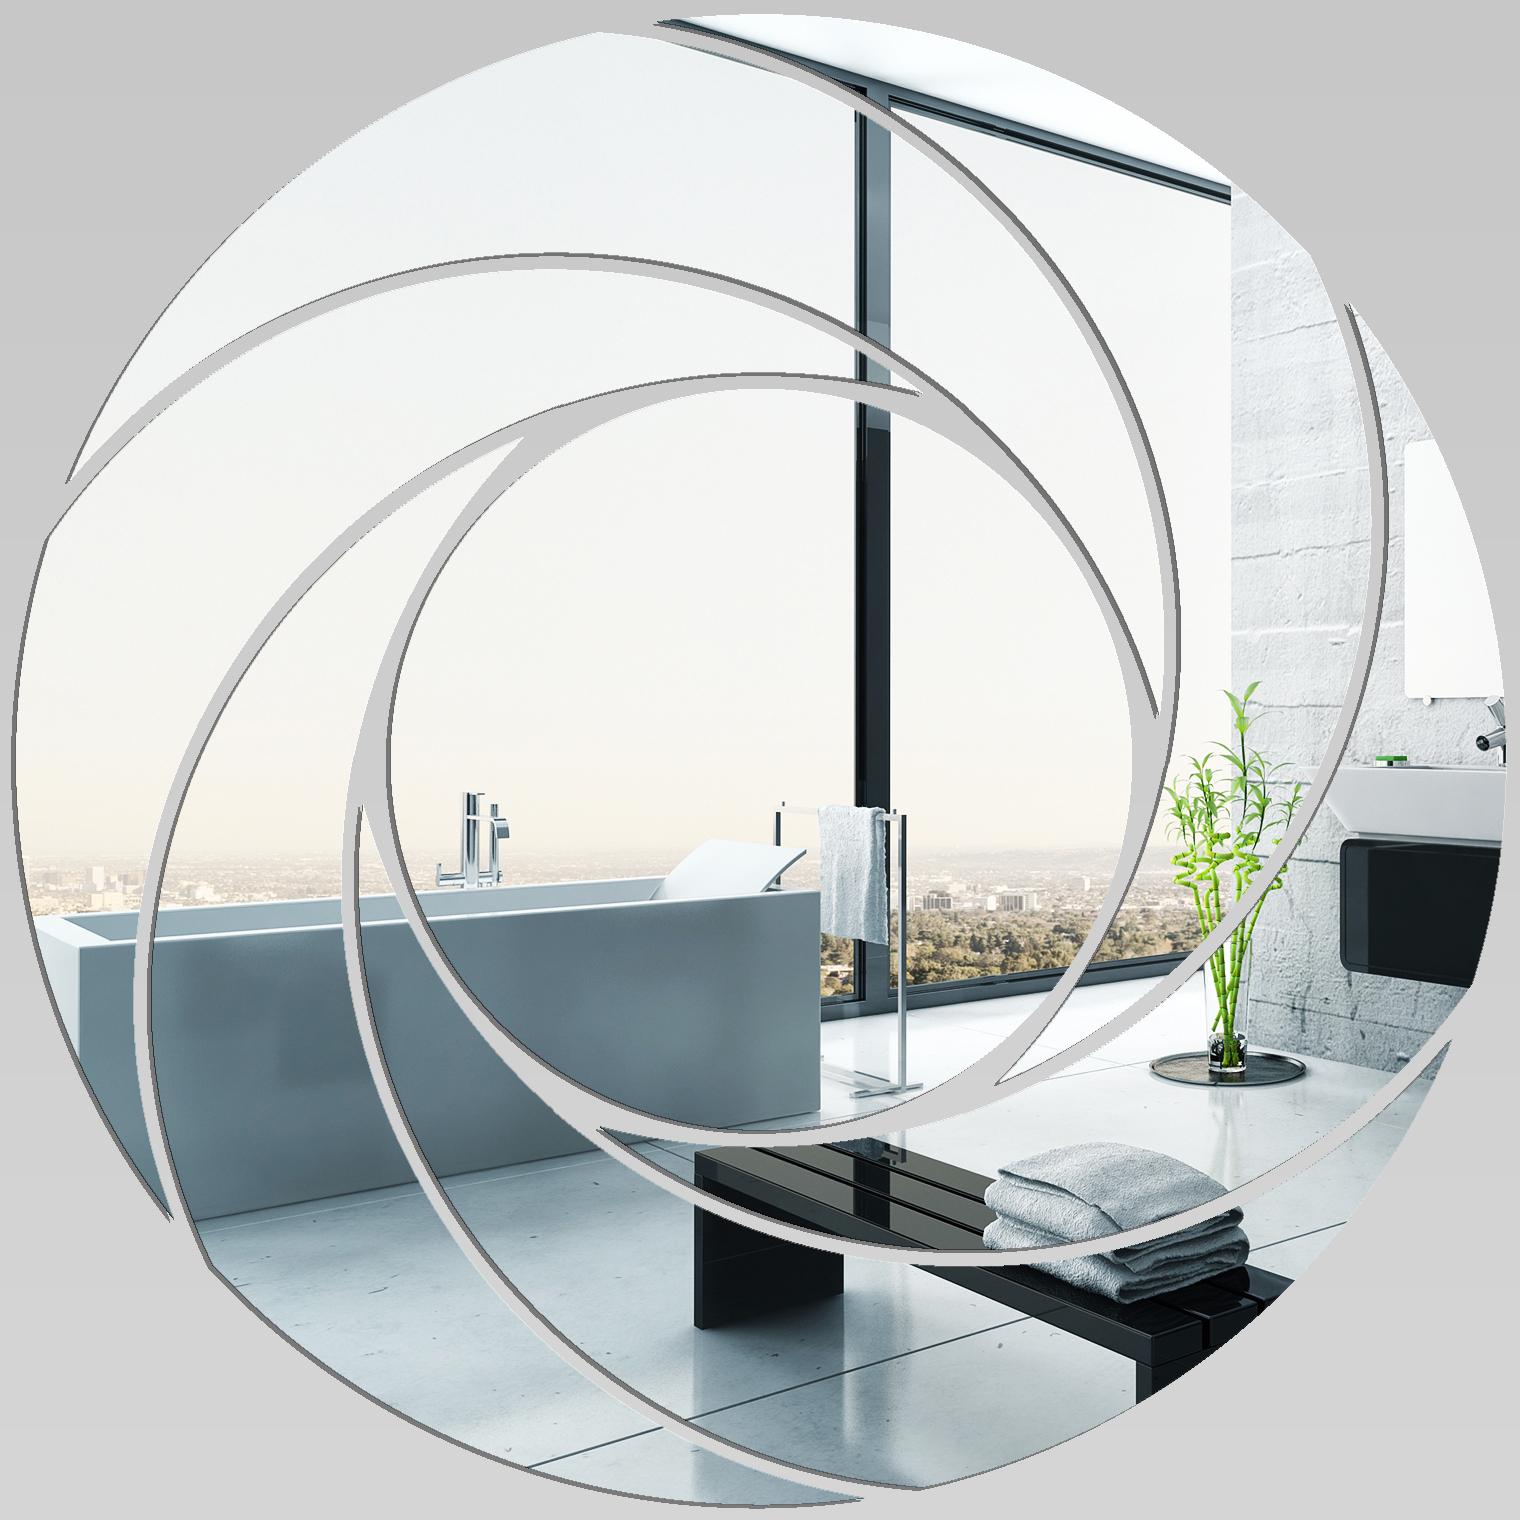 wandtattoos folies wandspiegel aus acrylglas spirale design. Black Bedroom Furniture Sets. Home Design Ideas